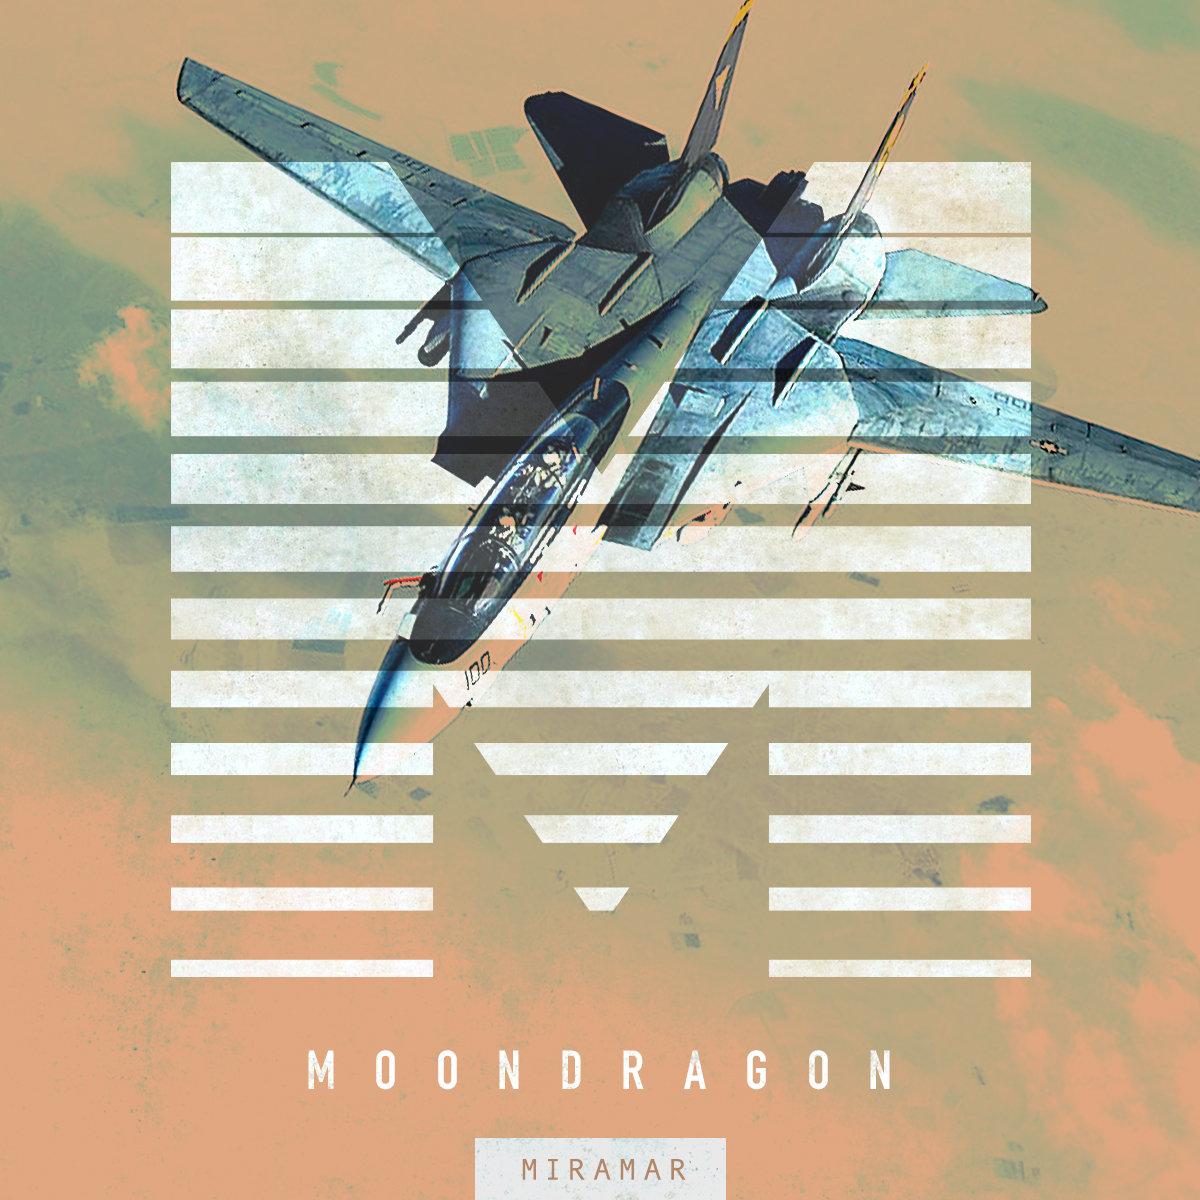 Moondragon, Miramar